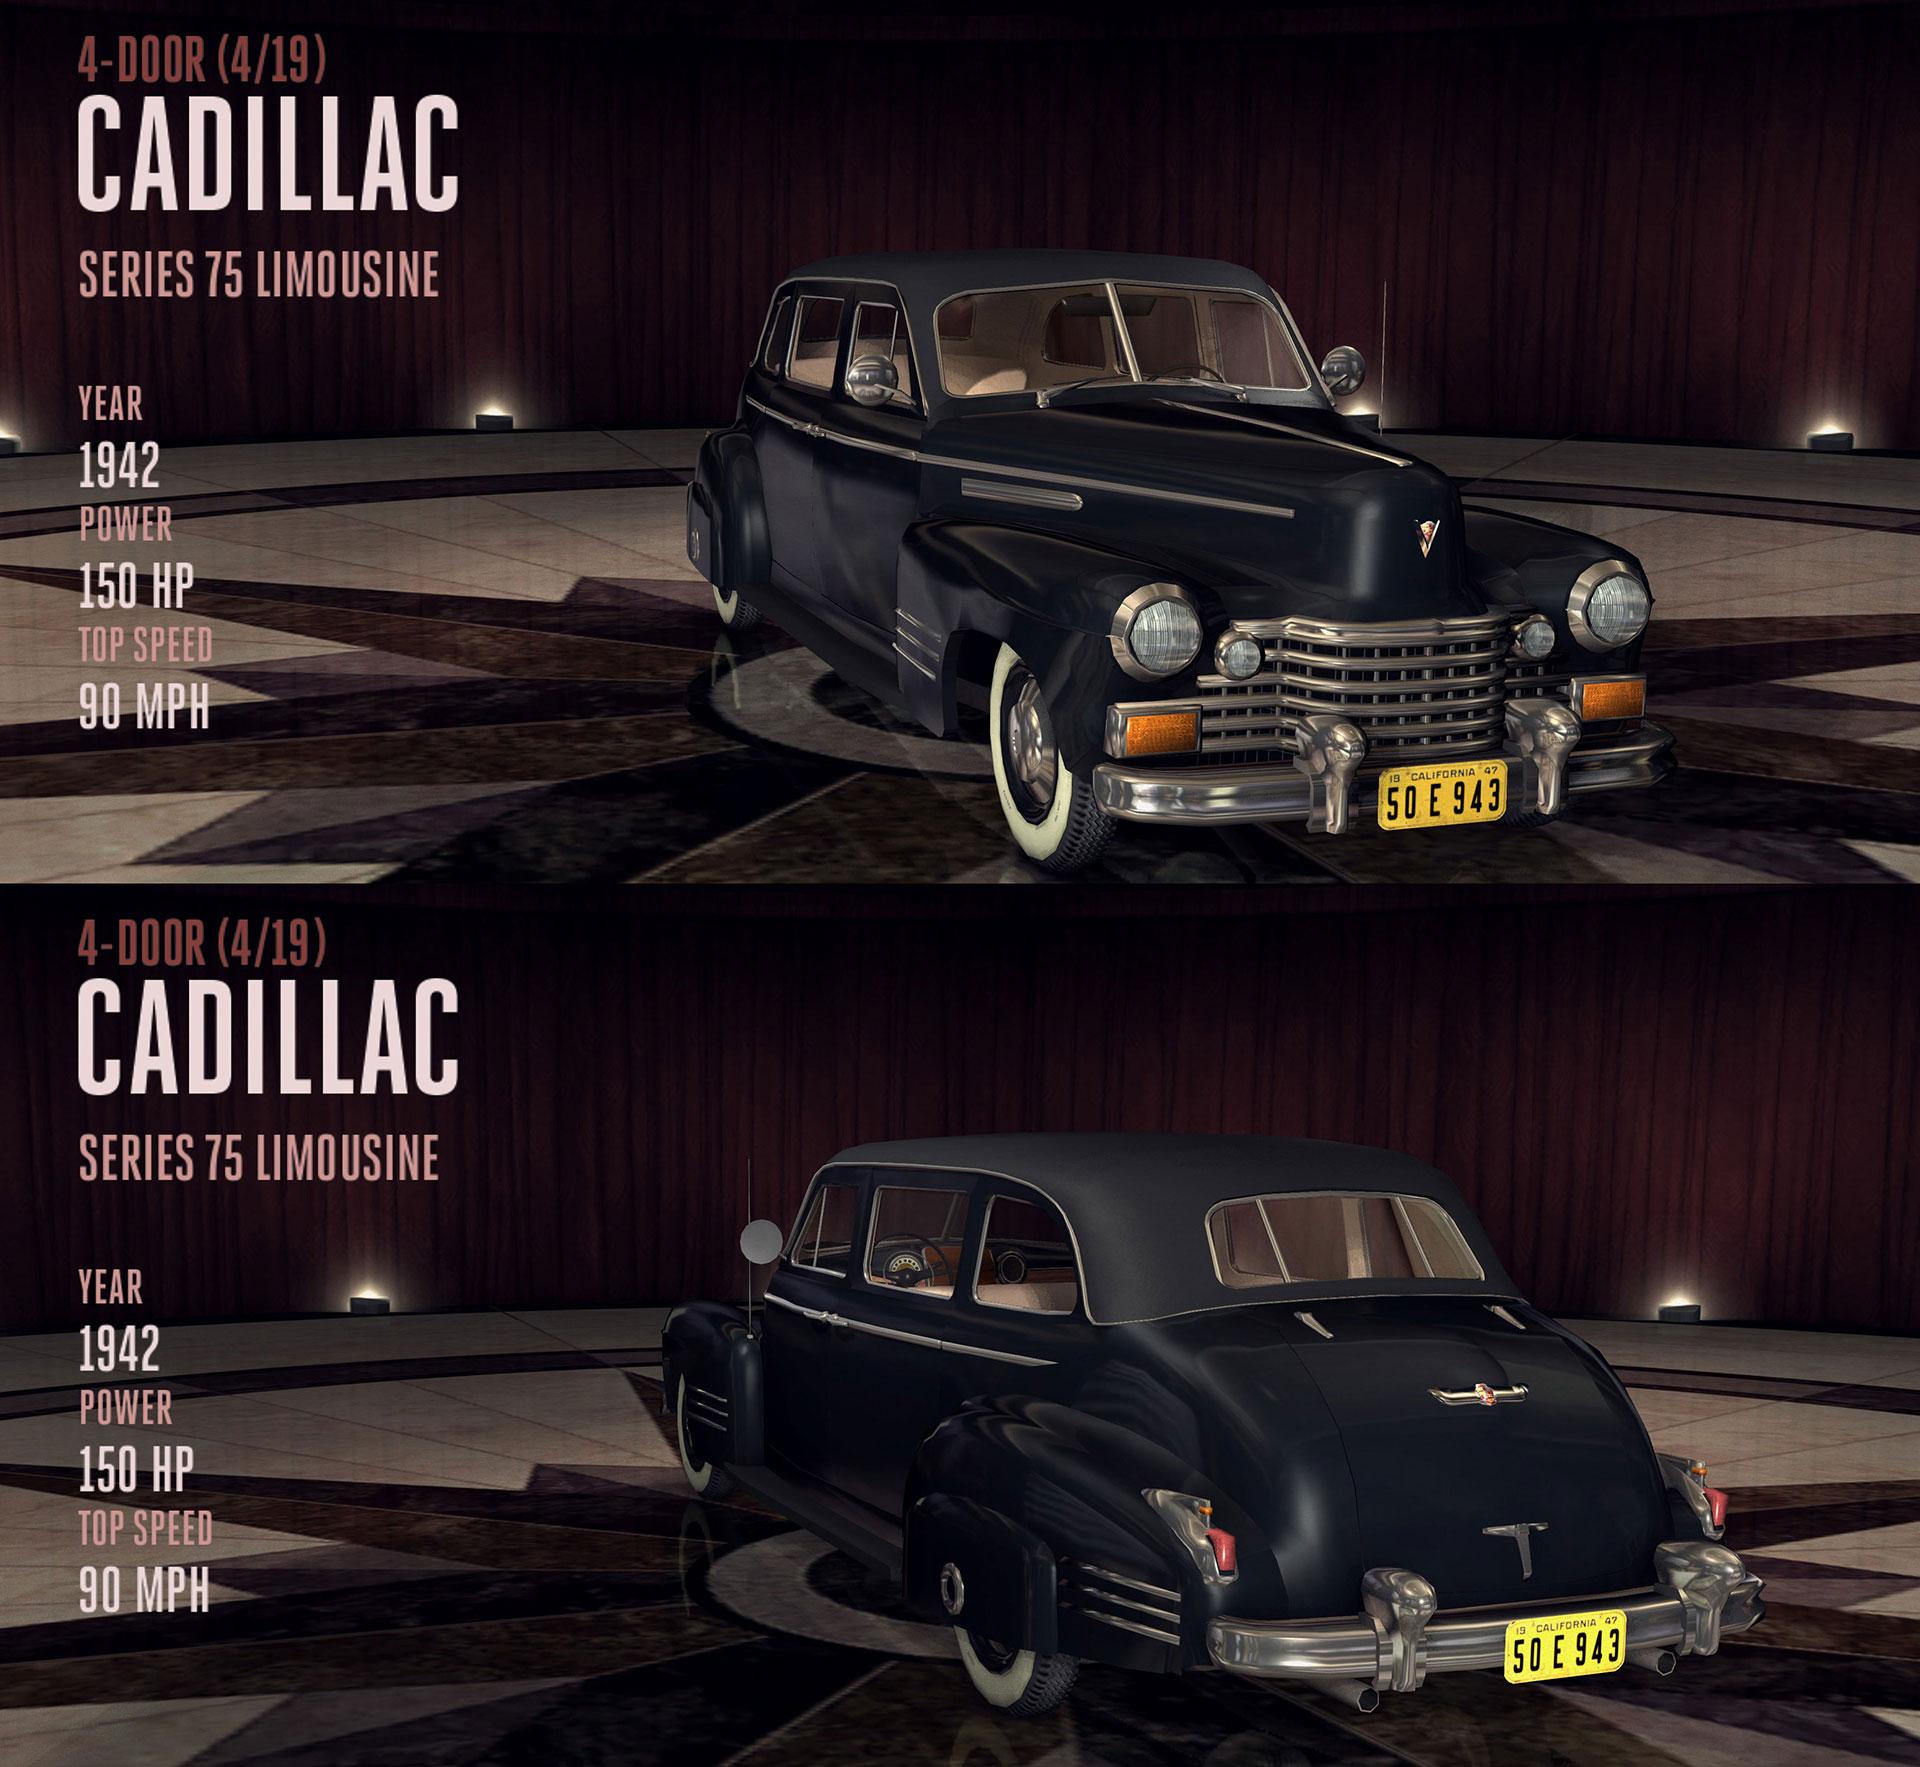 Cadillac Series 75 Limousine